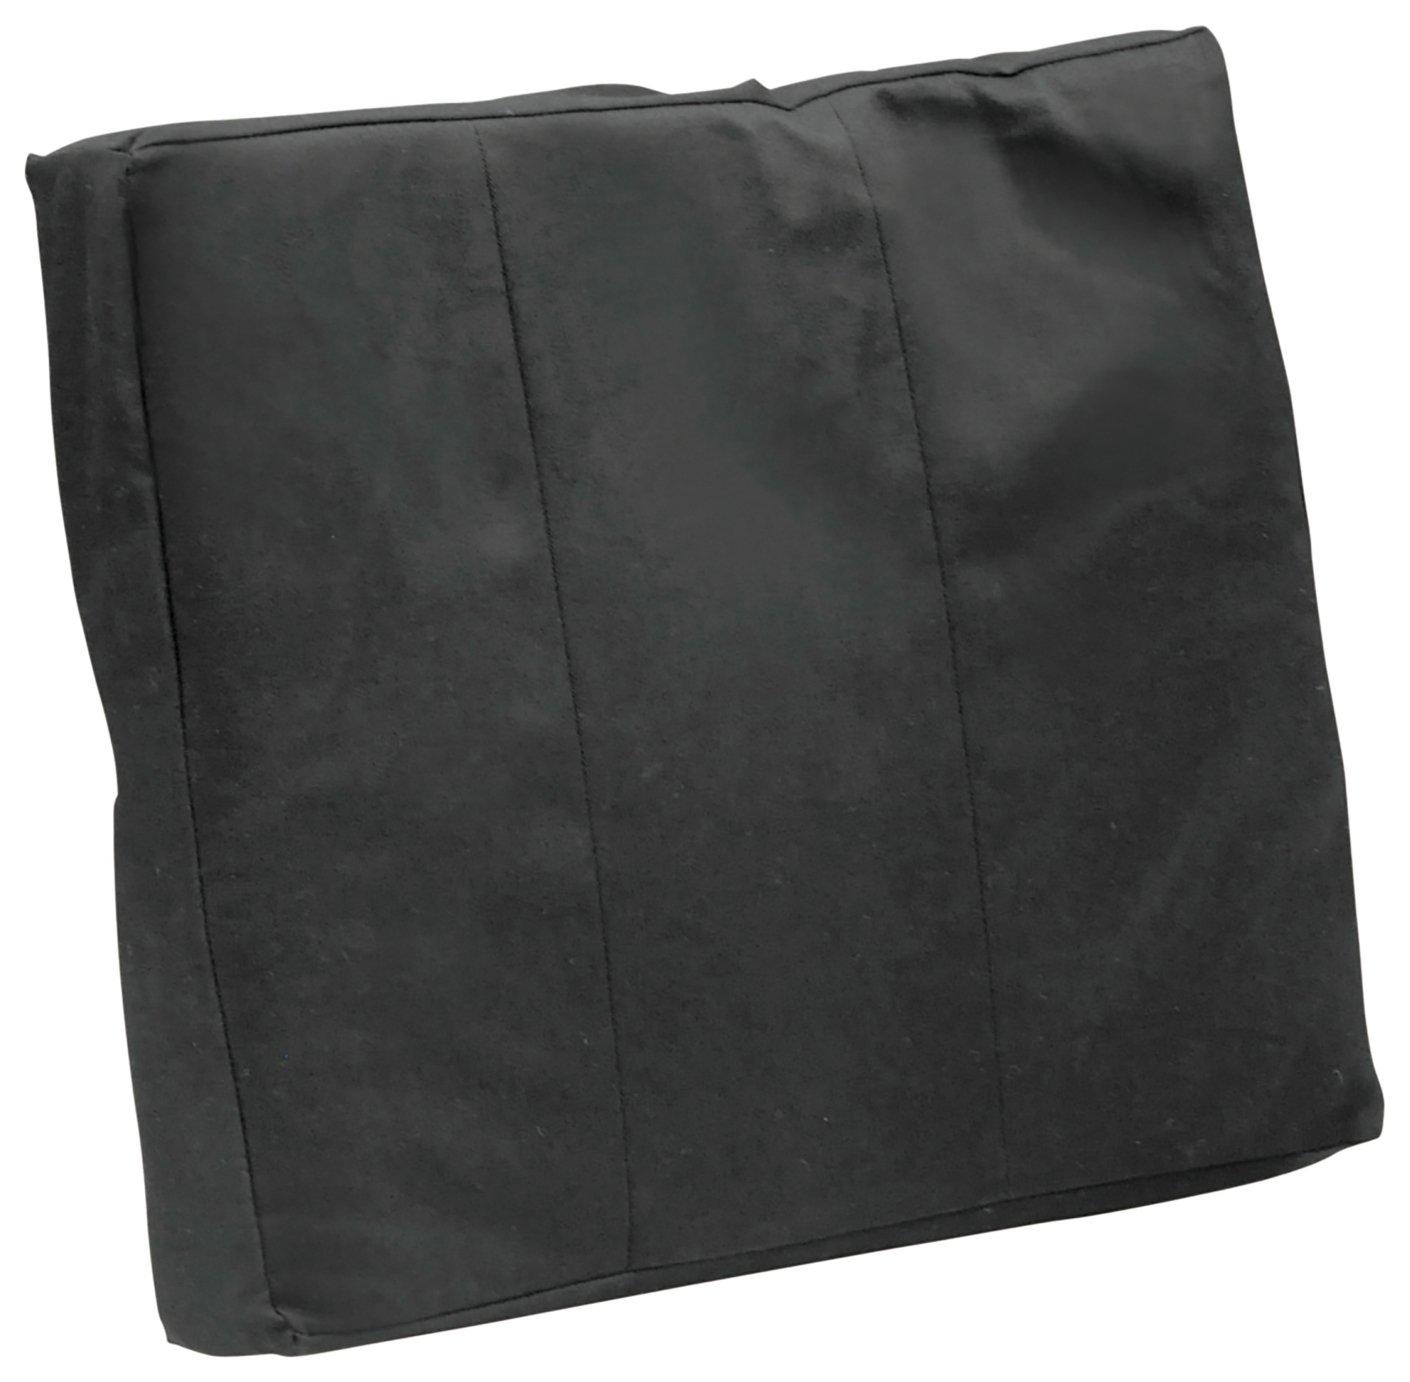 Aidapt Lumbar Support Cushion